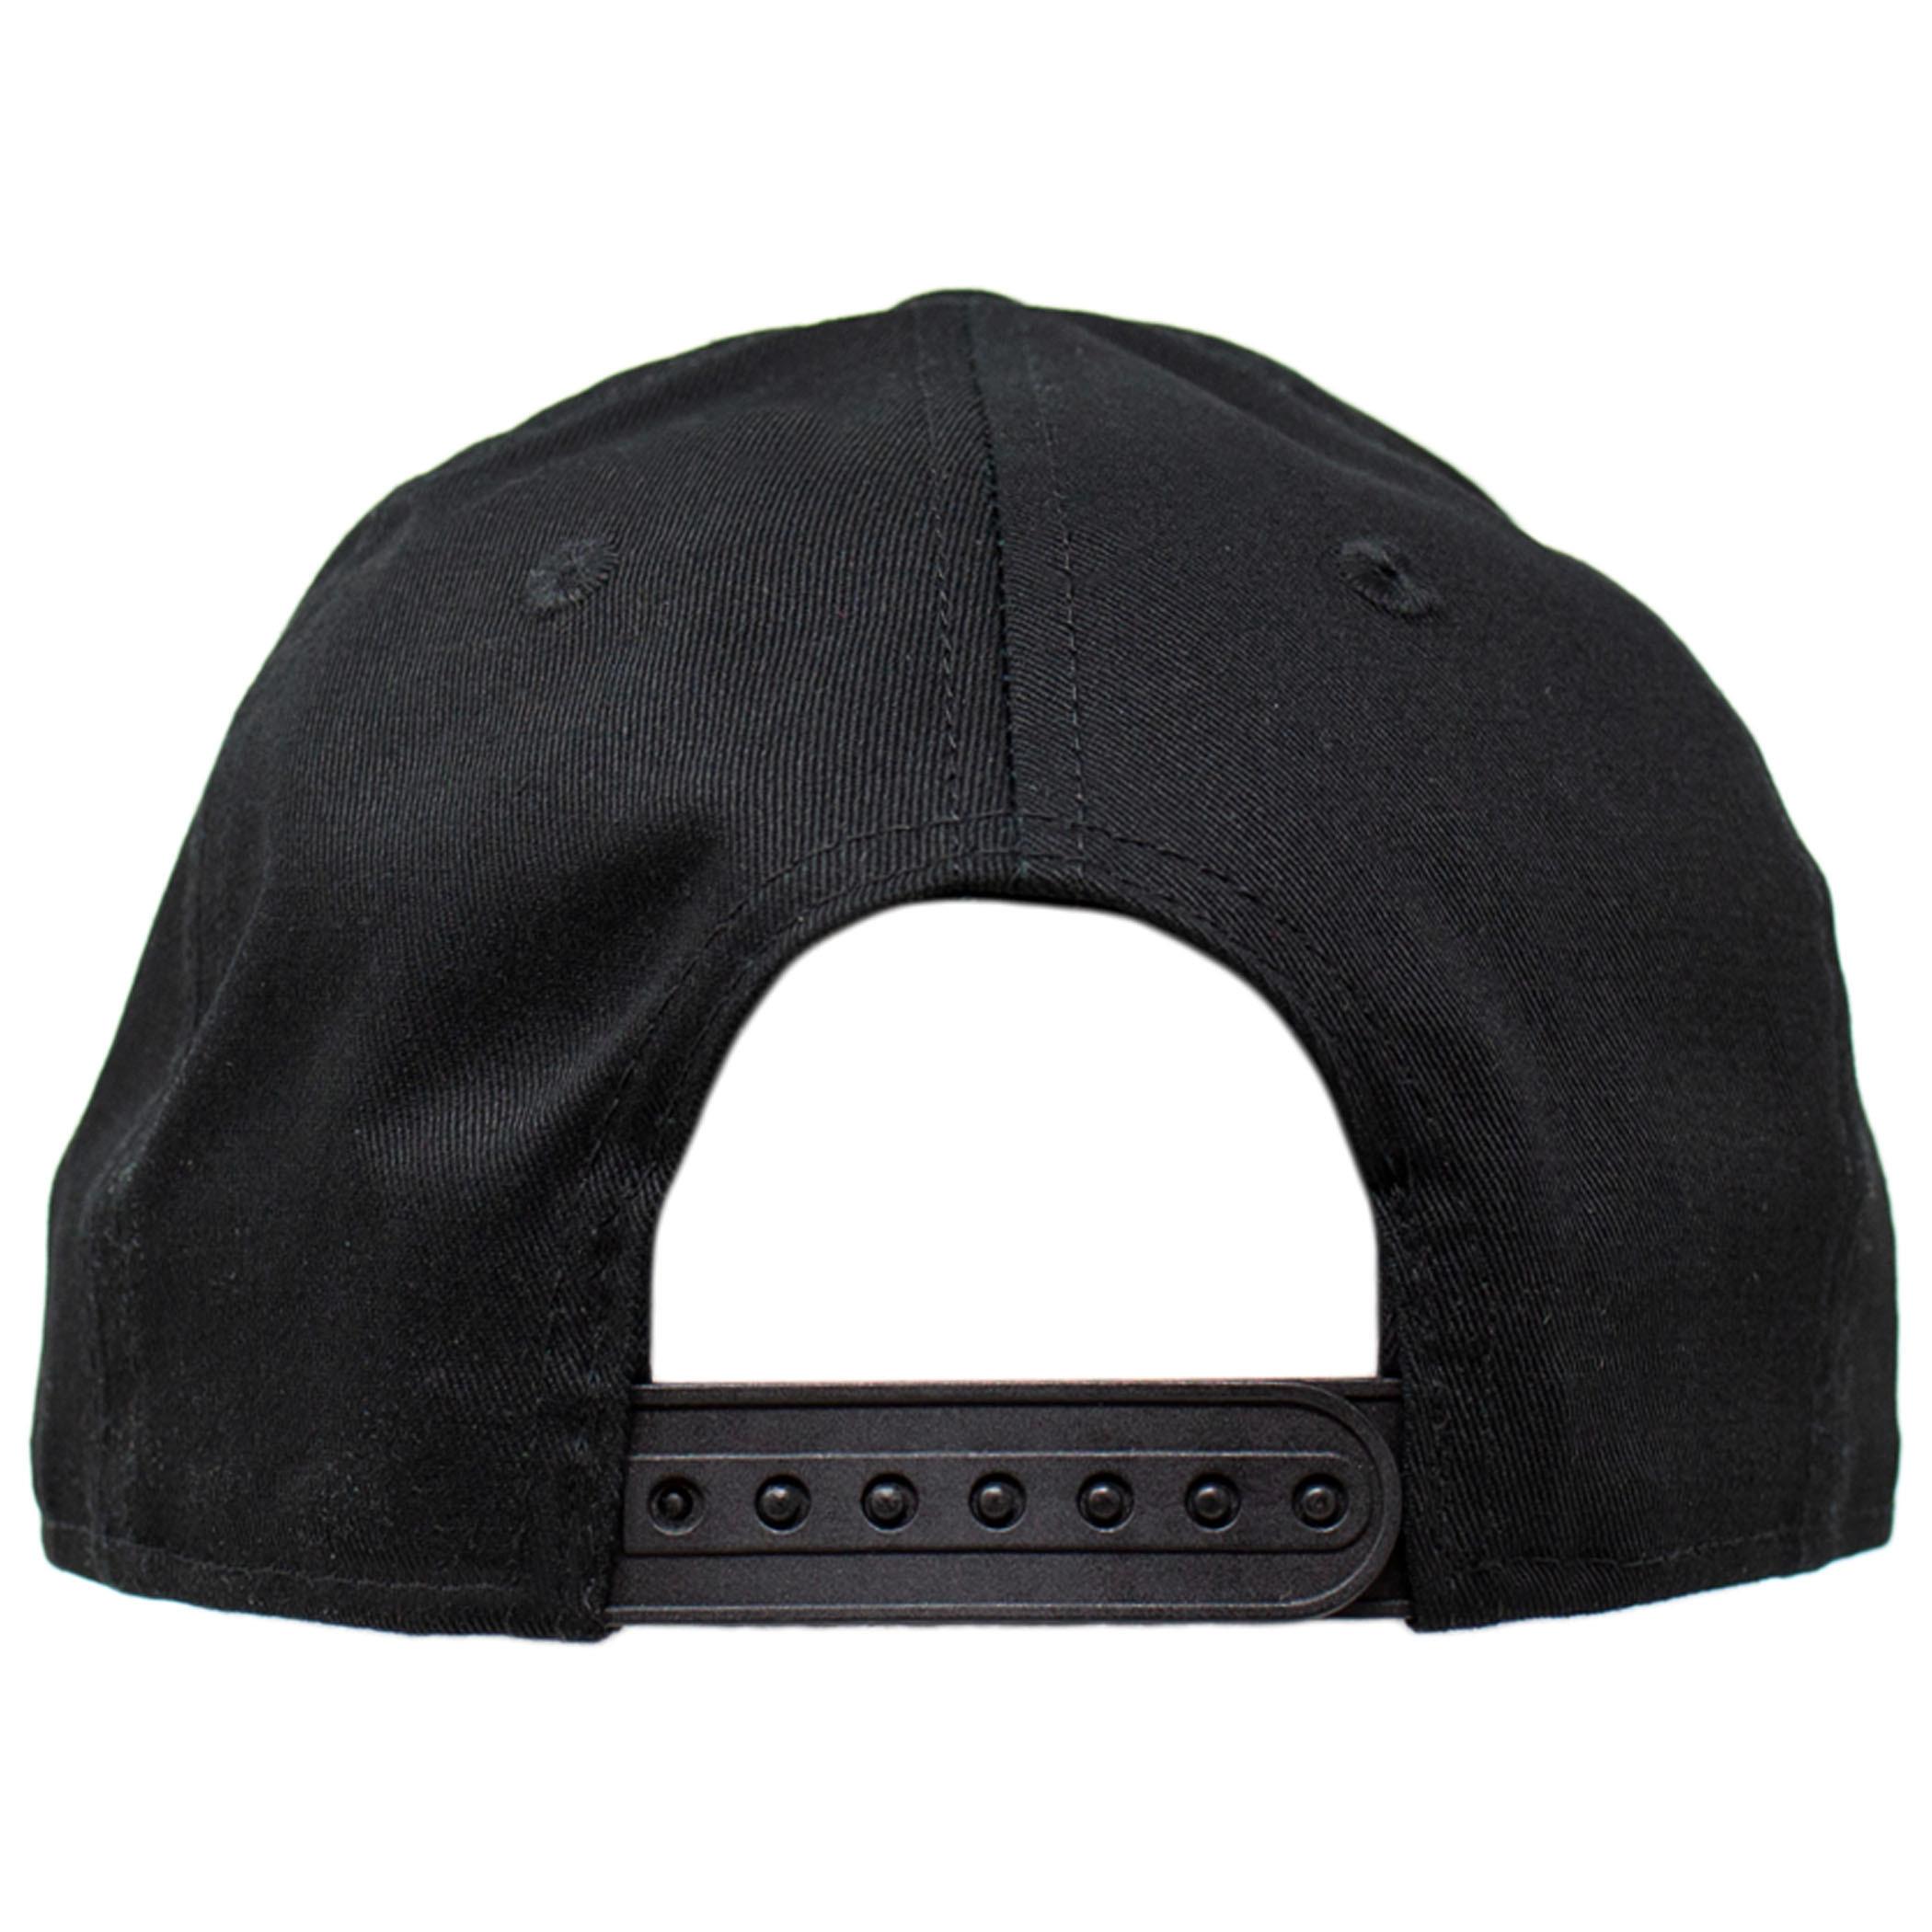 Punisher Symbol Black on Black New Era 9Fifty Adjustable Hat